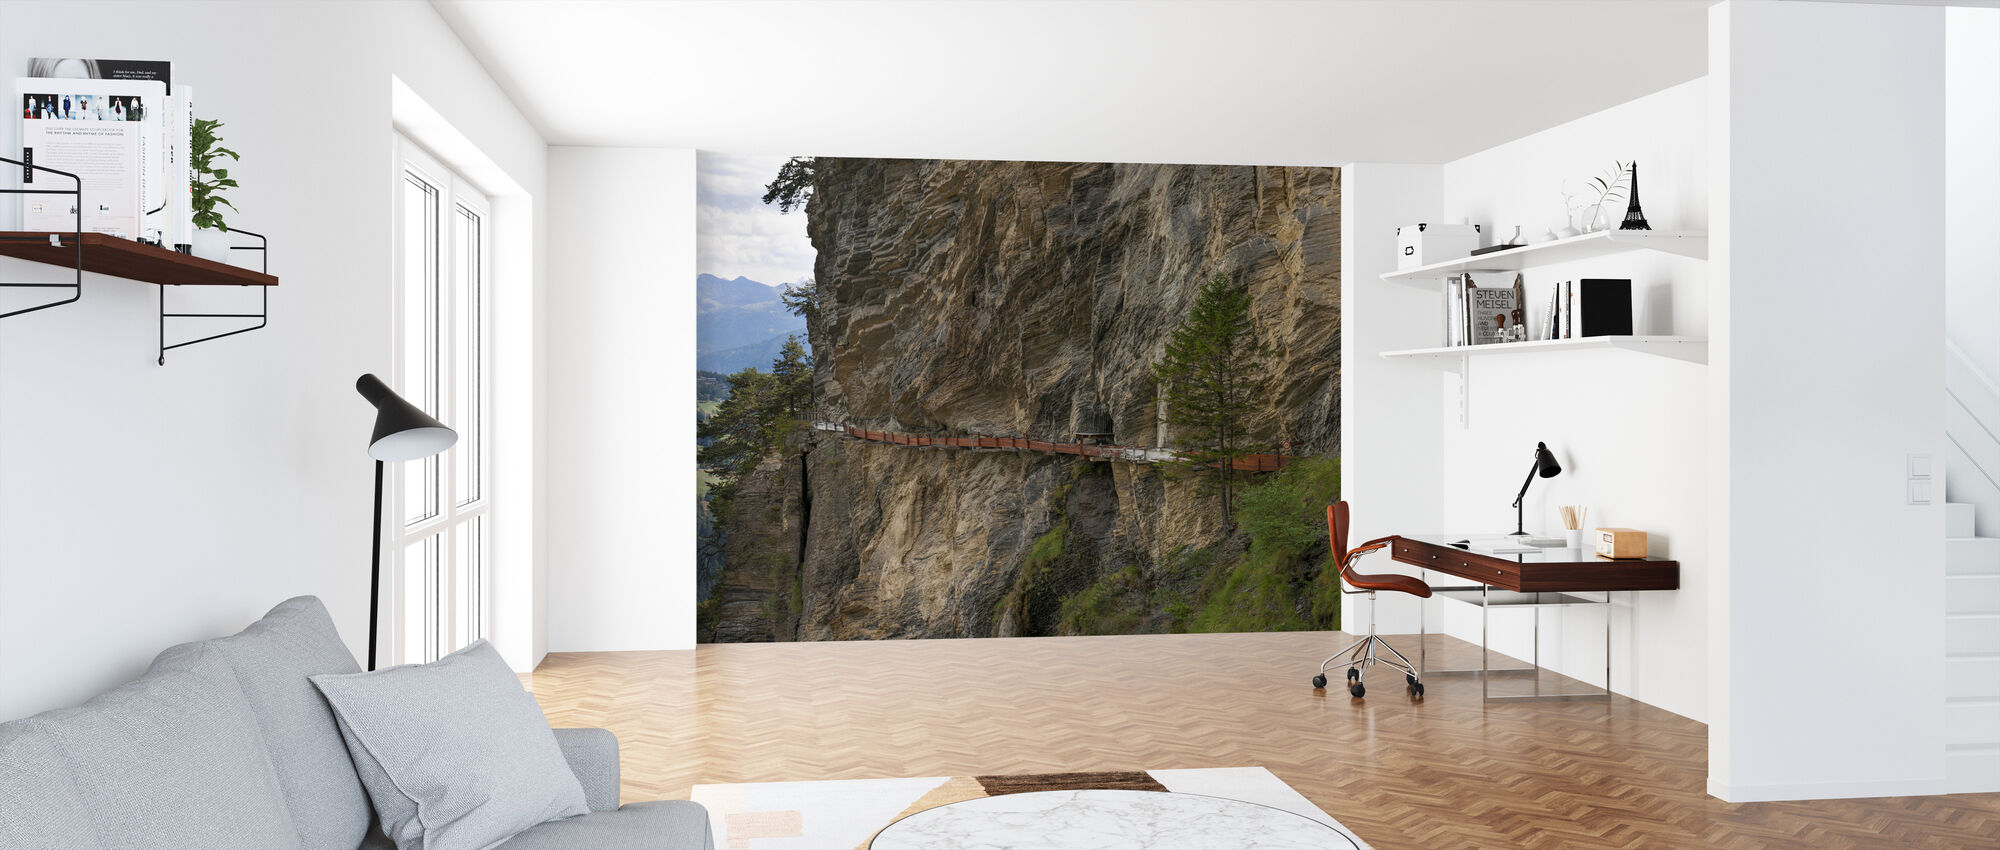 Irrigation Channel - Wallpaper - Office